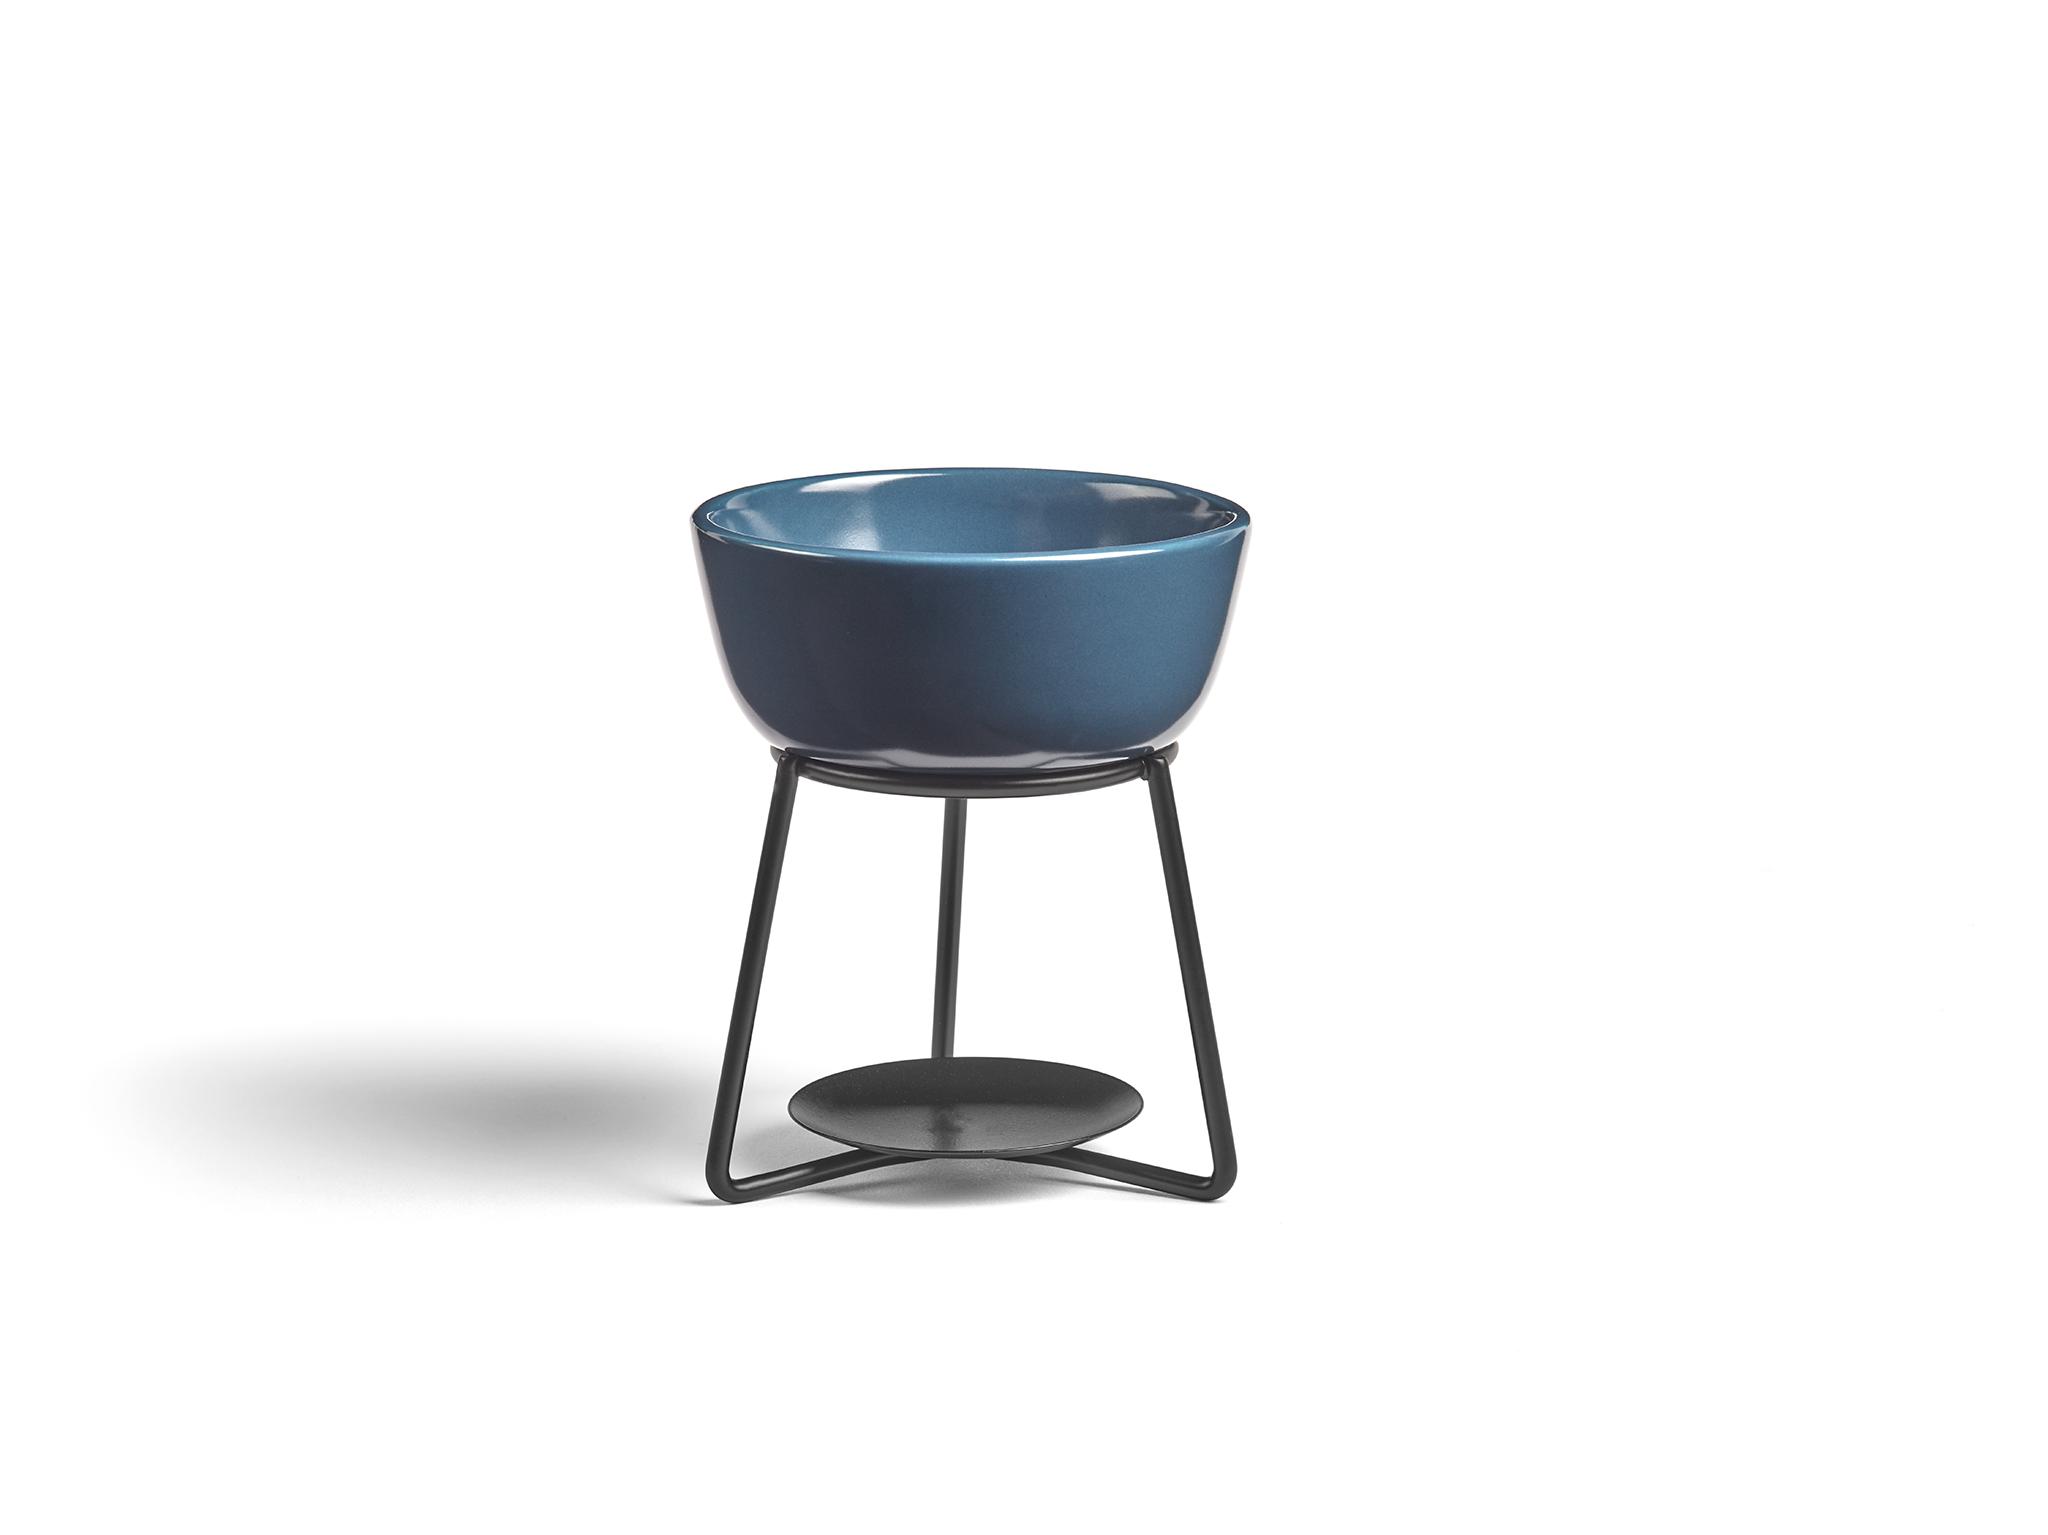 Yankee Candle - Orion Blue Pebble Tartburner